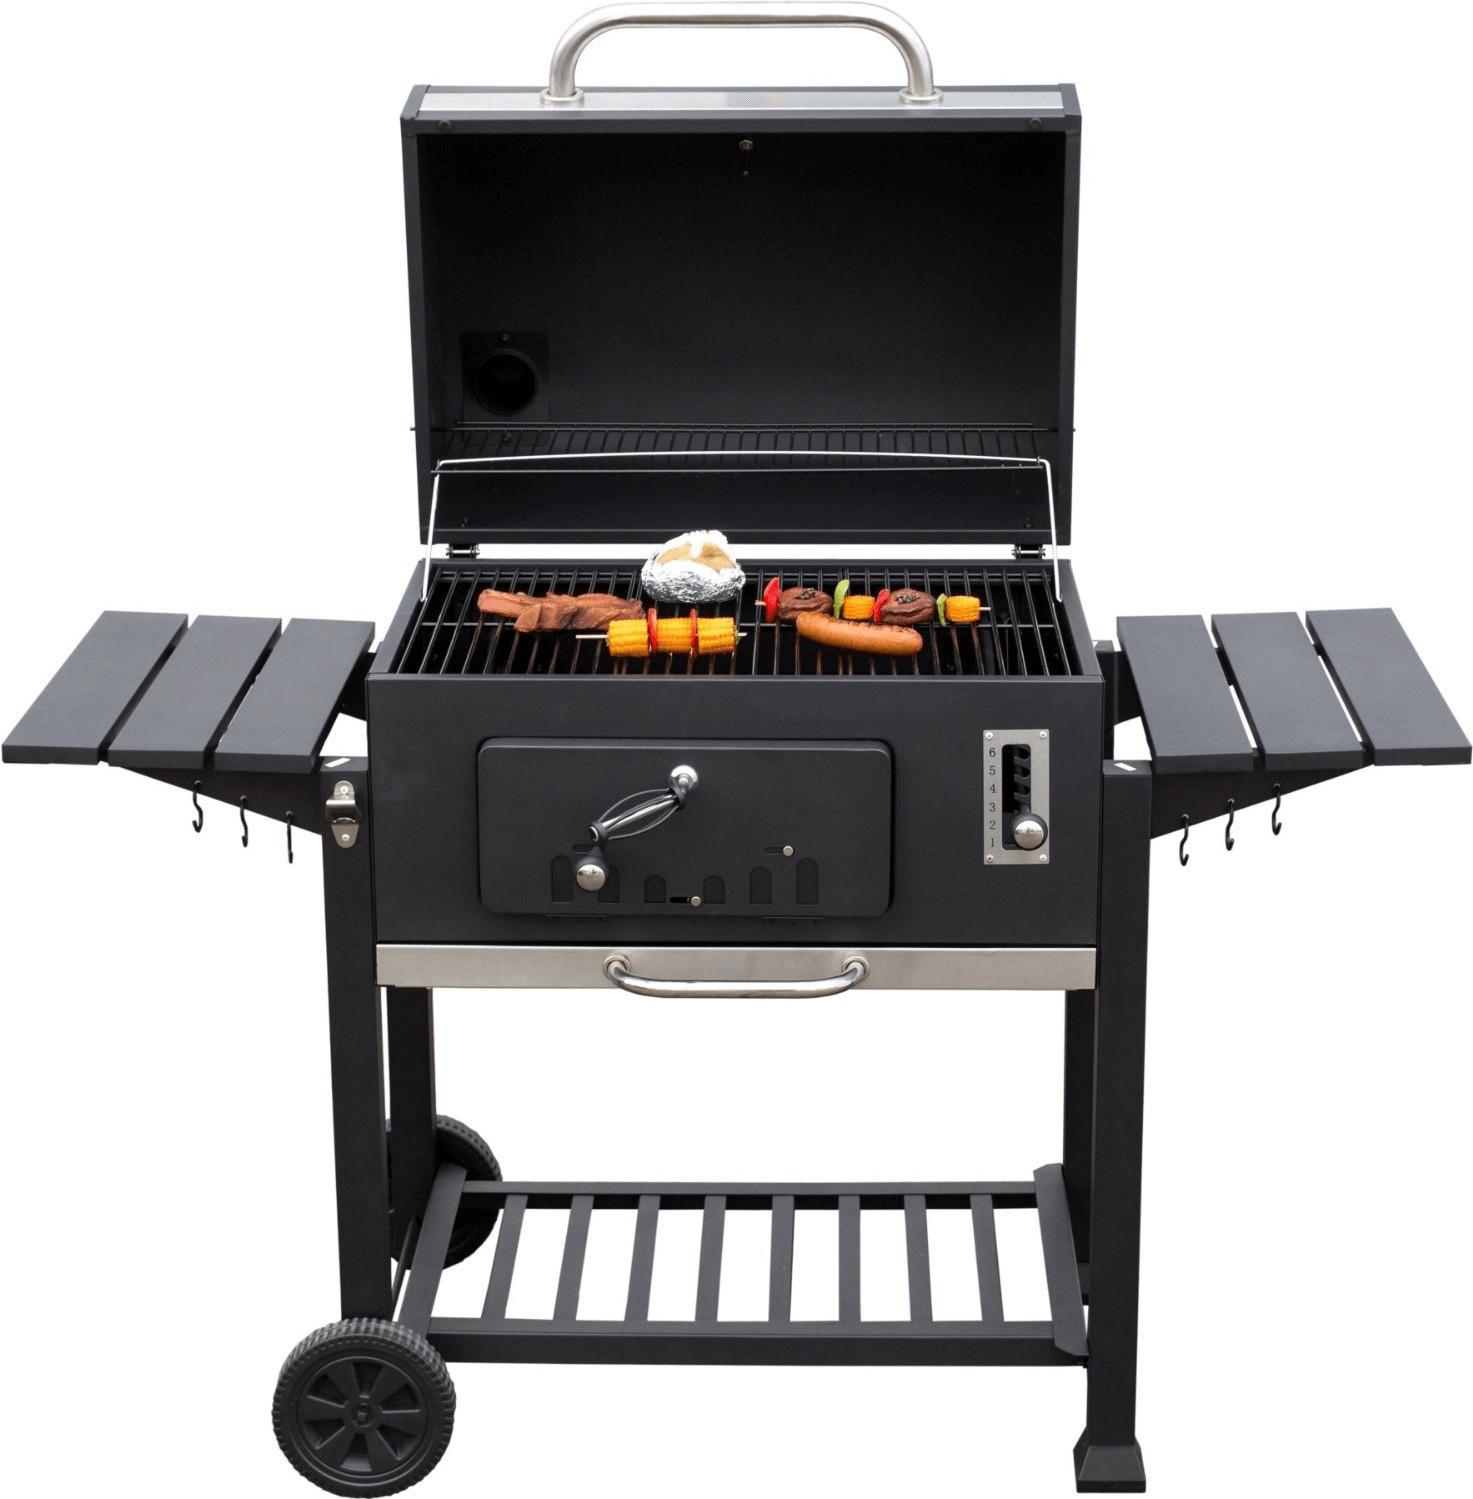 Grill-Aktion: z.B. Holzkohlegrill El Fuego Ontario XXL für 149€ und diverse Grillzubehör